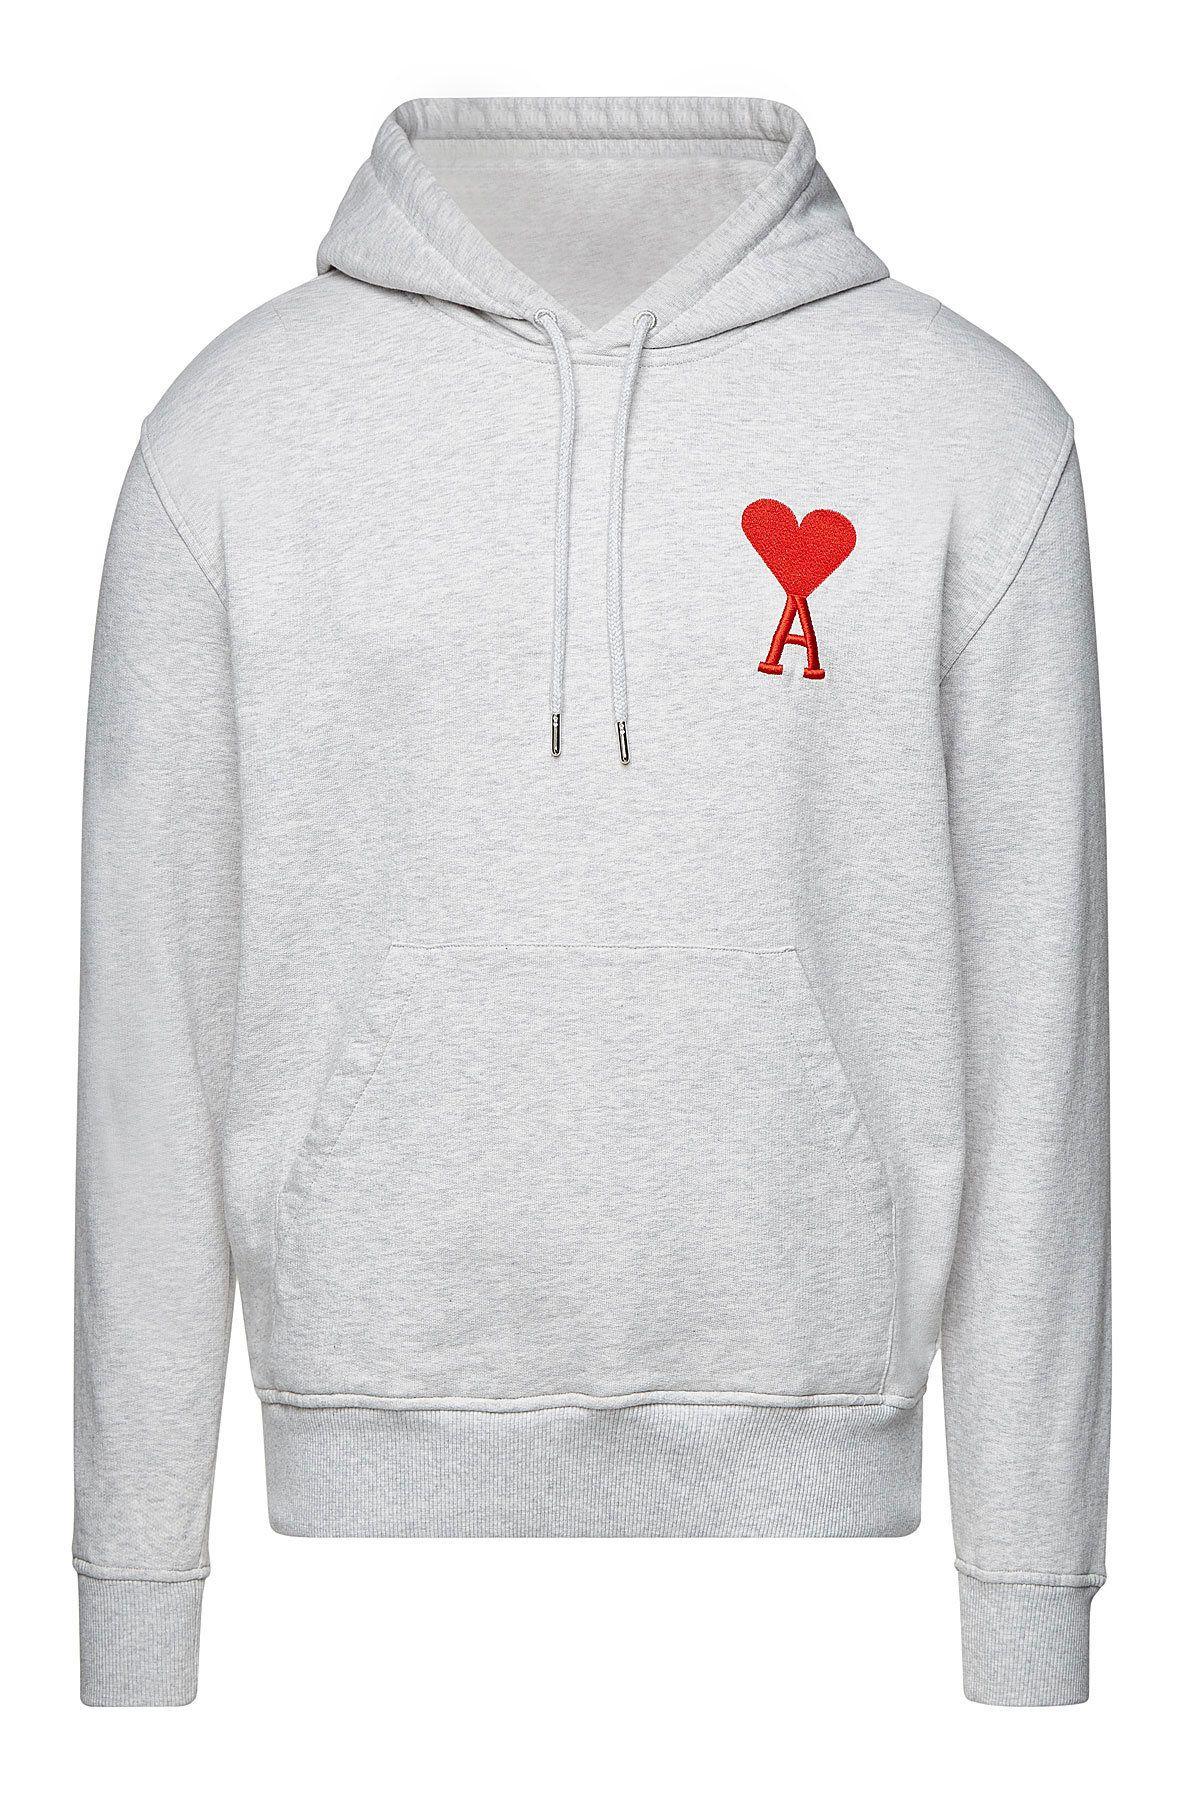 Men's Frore Sweater Knit Fleece Free Country Jackets